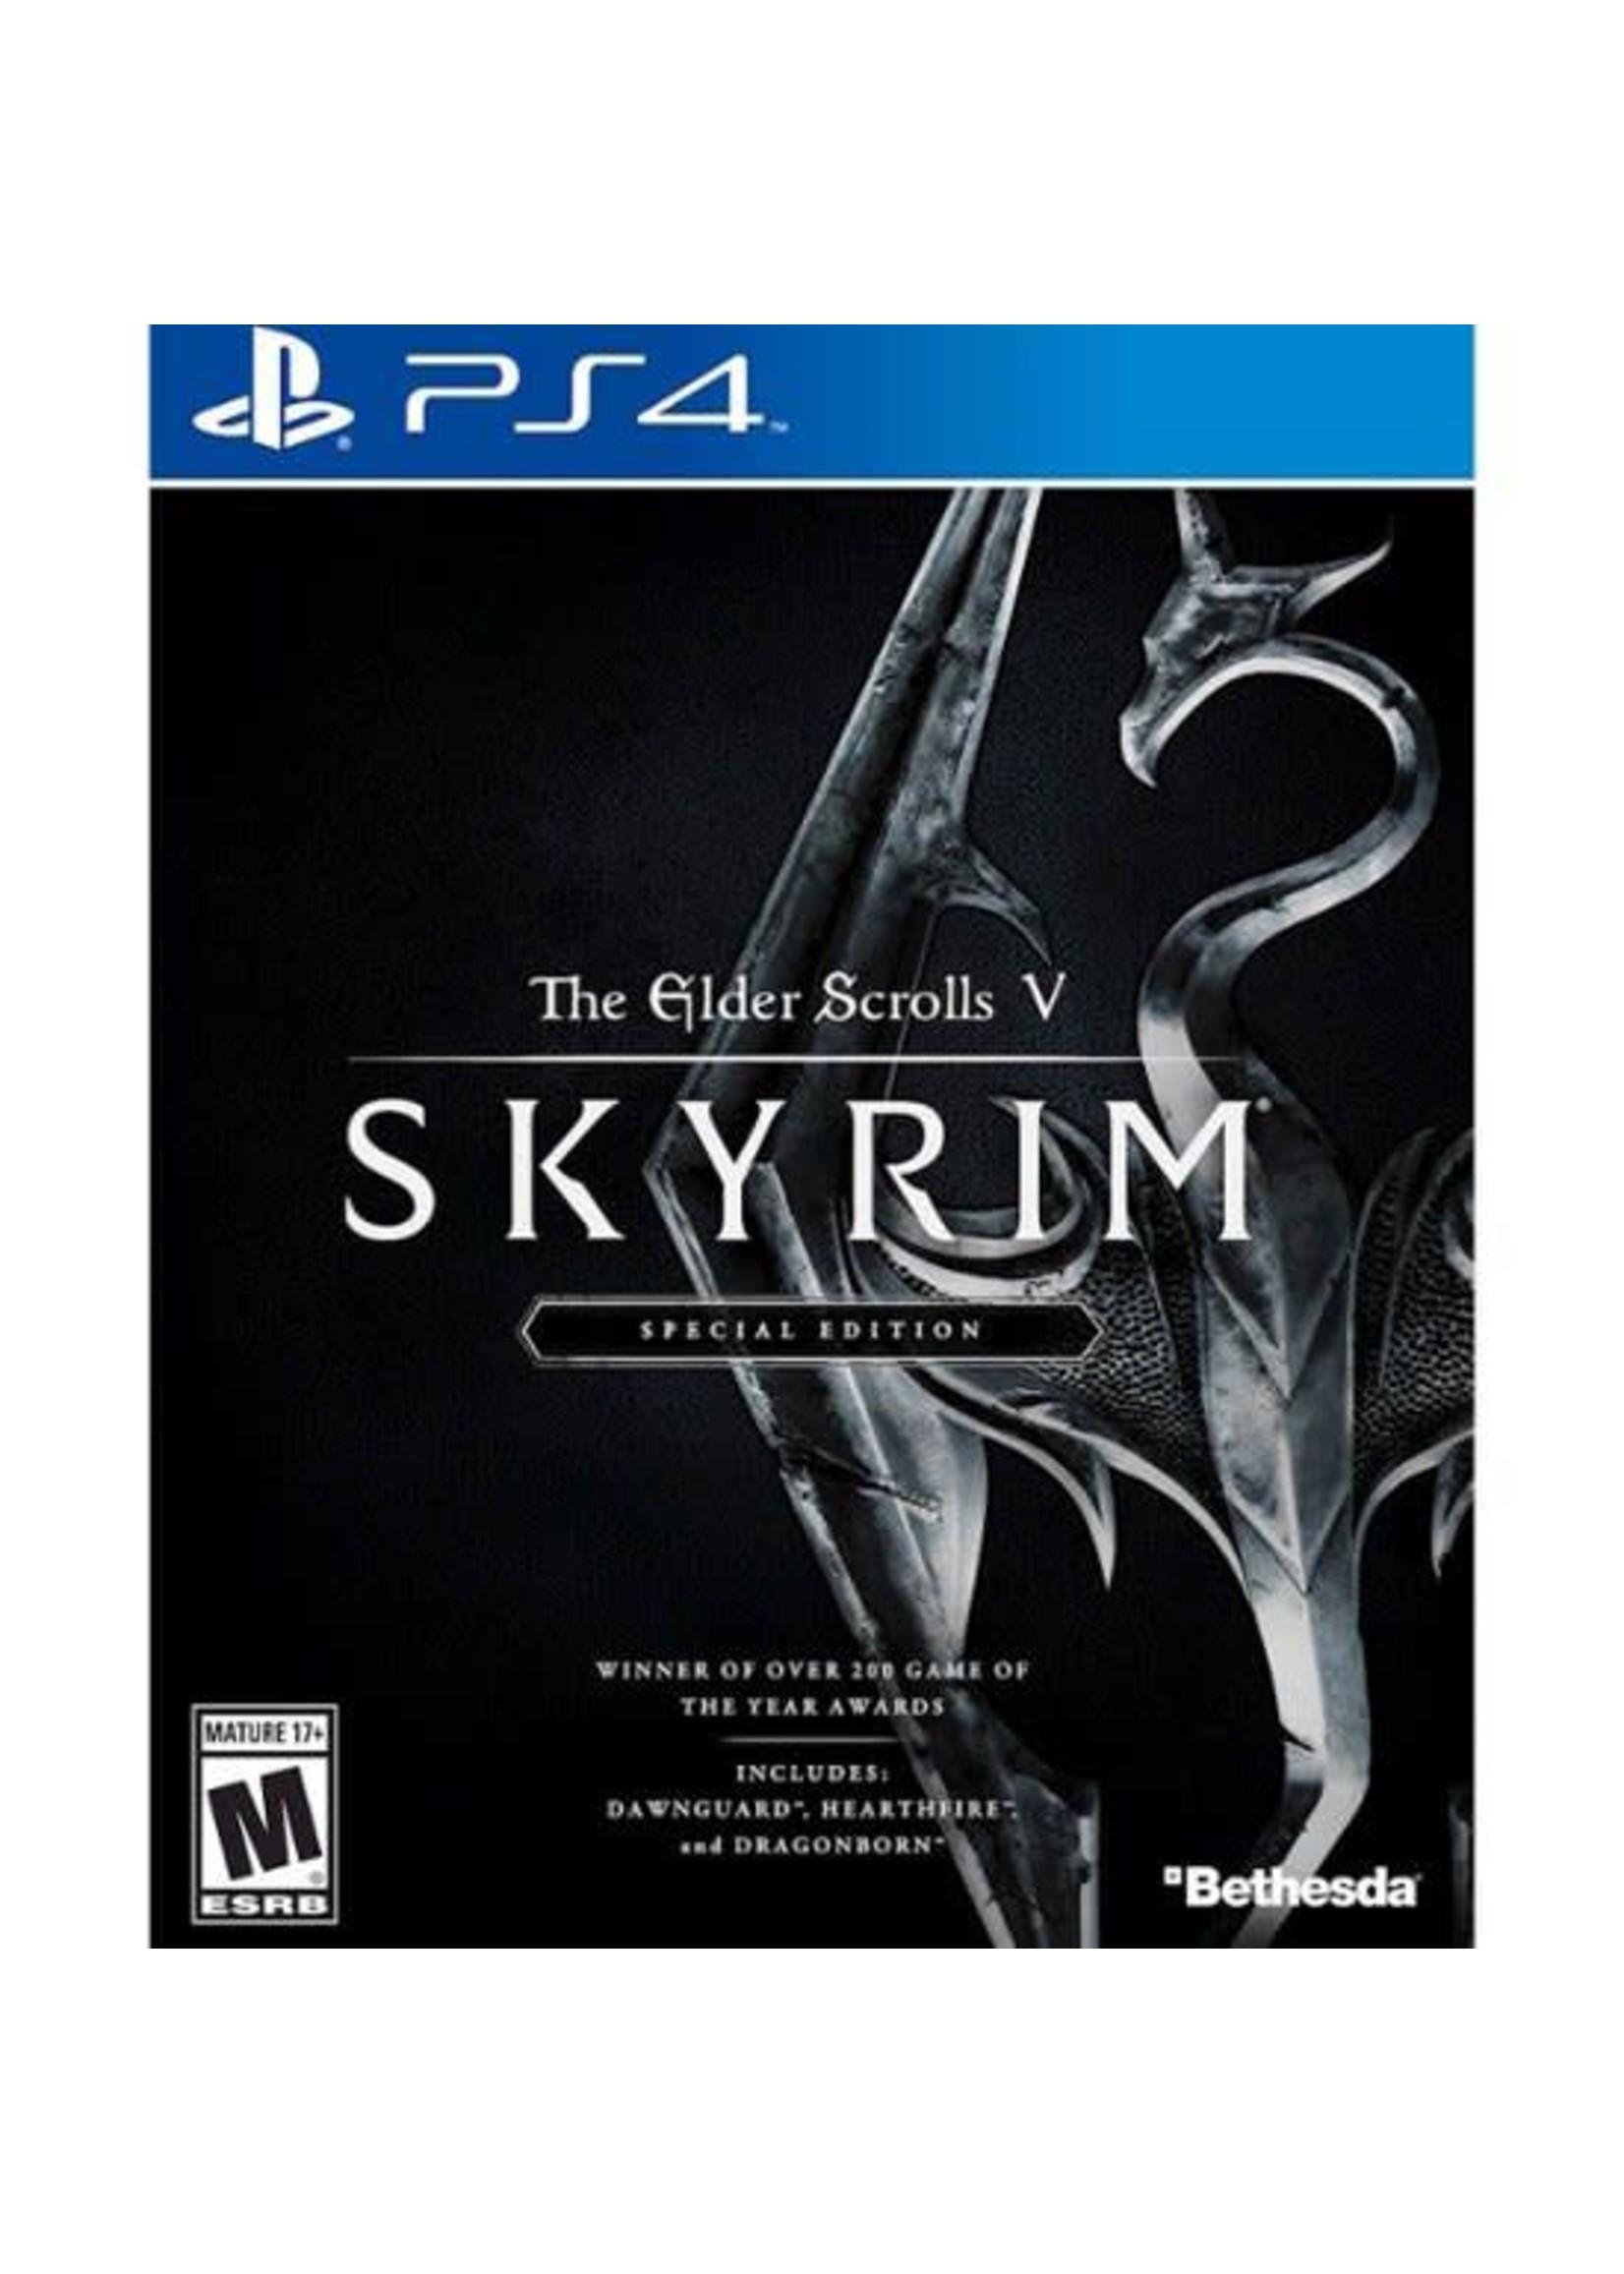 The Elder Scrolls 5: Skyrim Special Edition - PS4 NEW